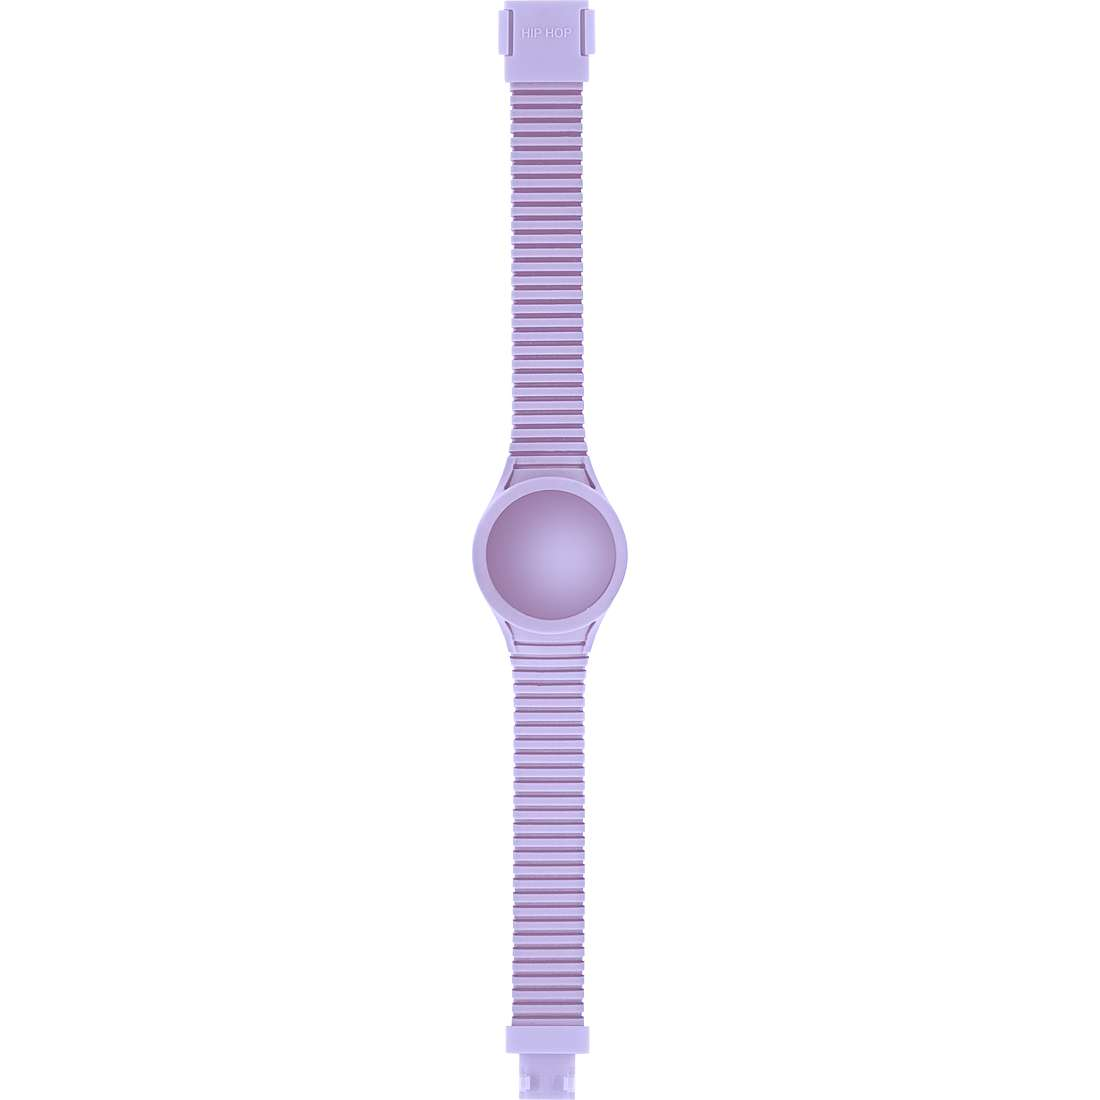 orologio accessorio donna Hip Hop Solar HBU0537